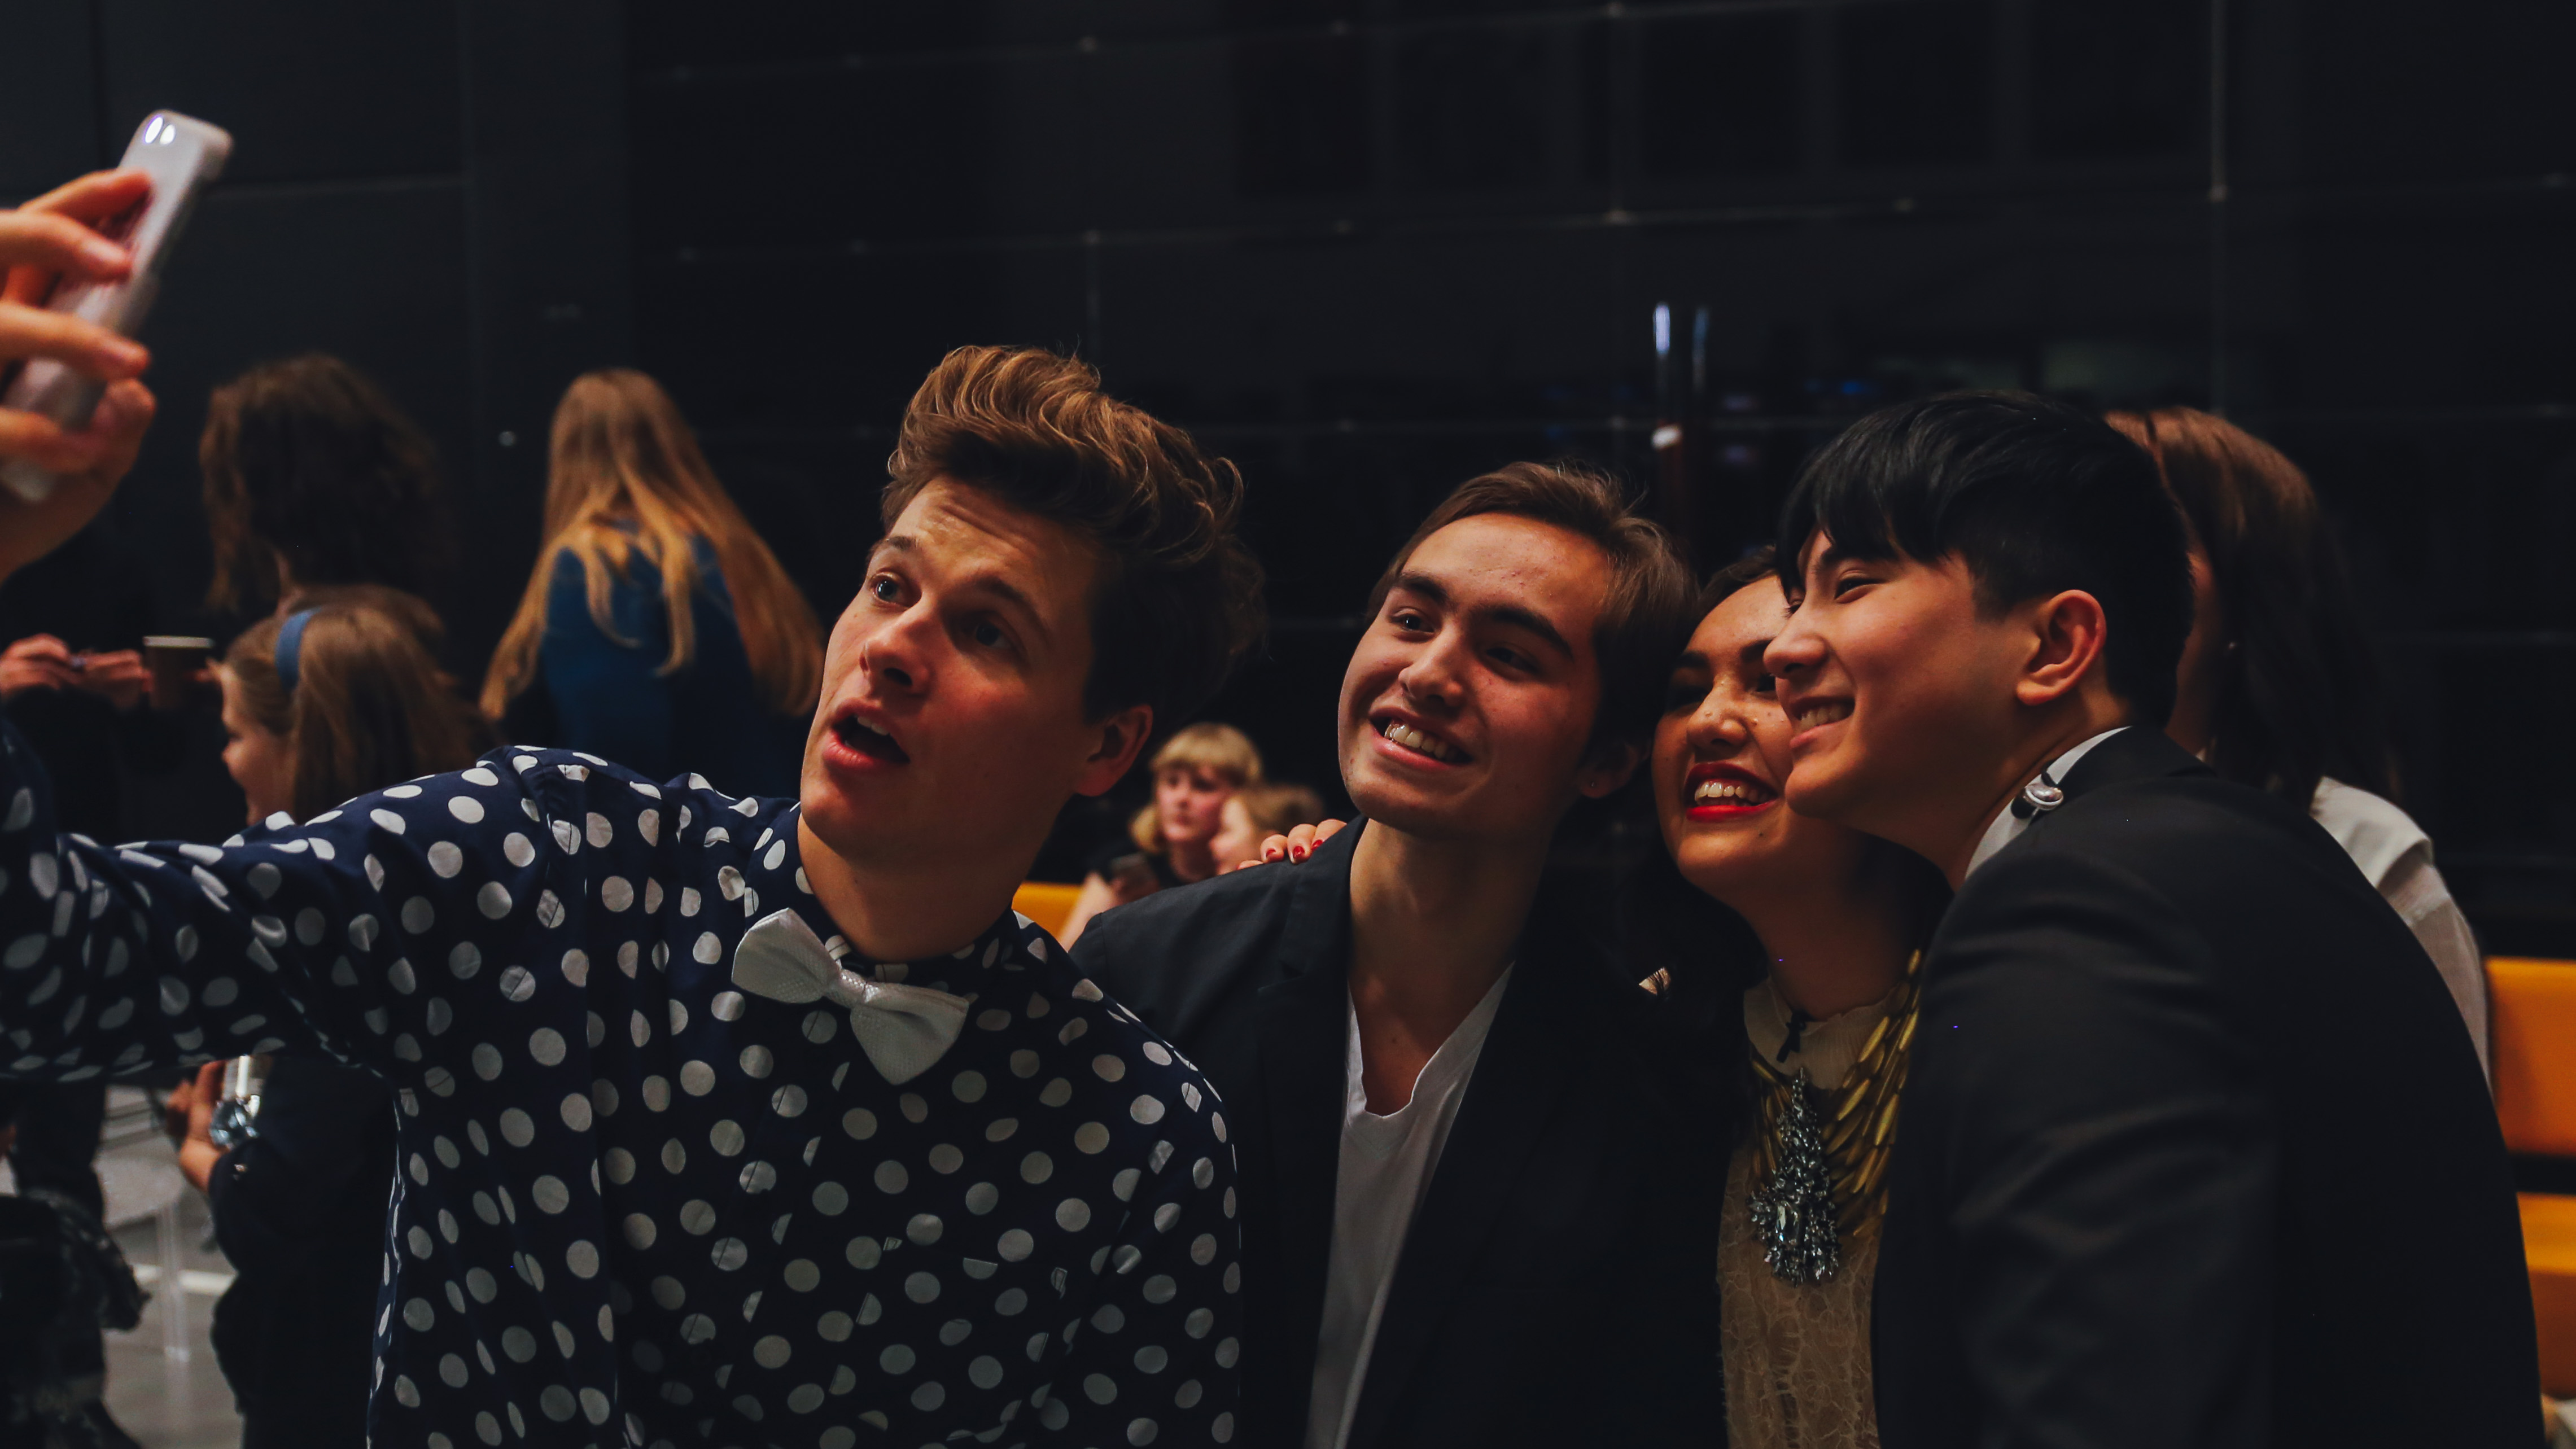 X Factor 2017 liveshow 4